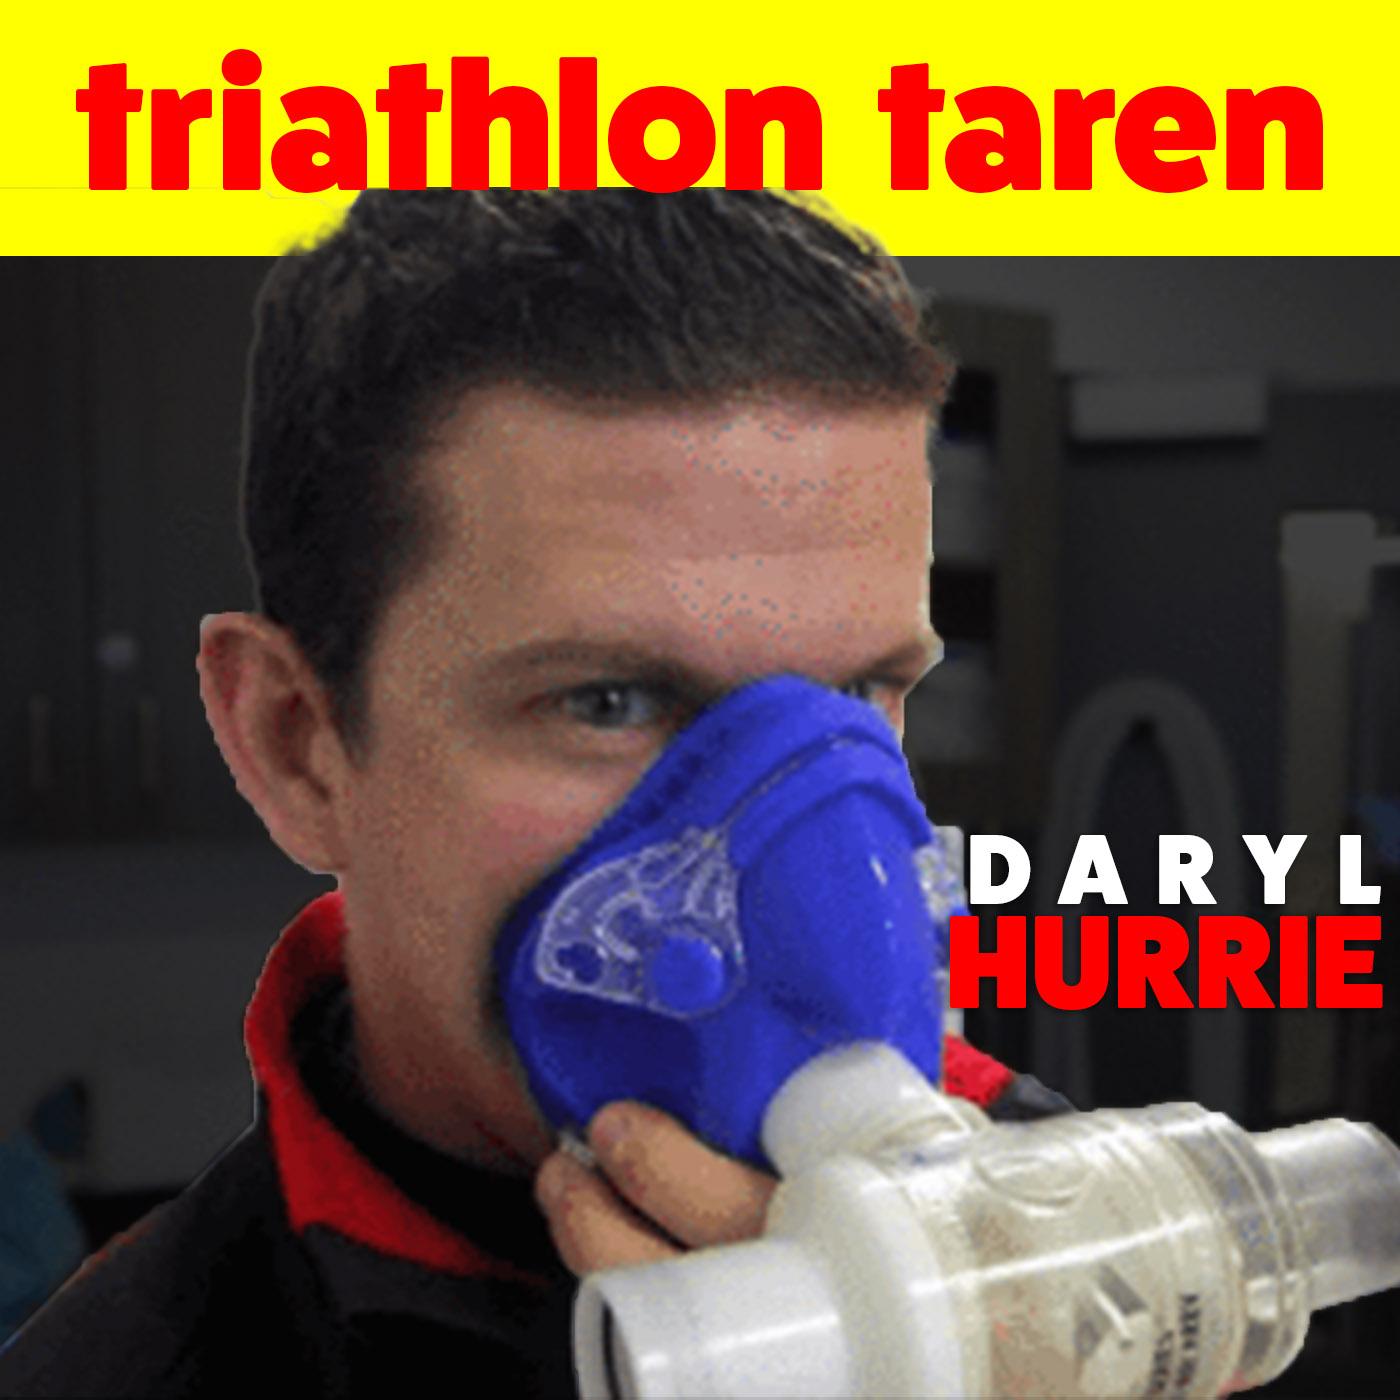 Daryl Hurrie Thumbnail